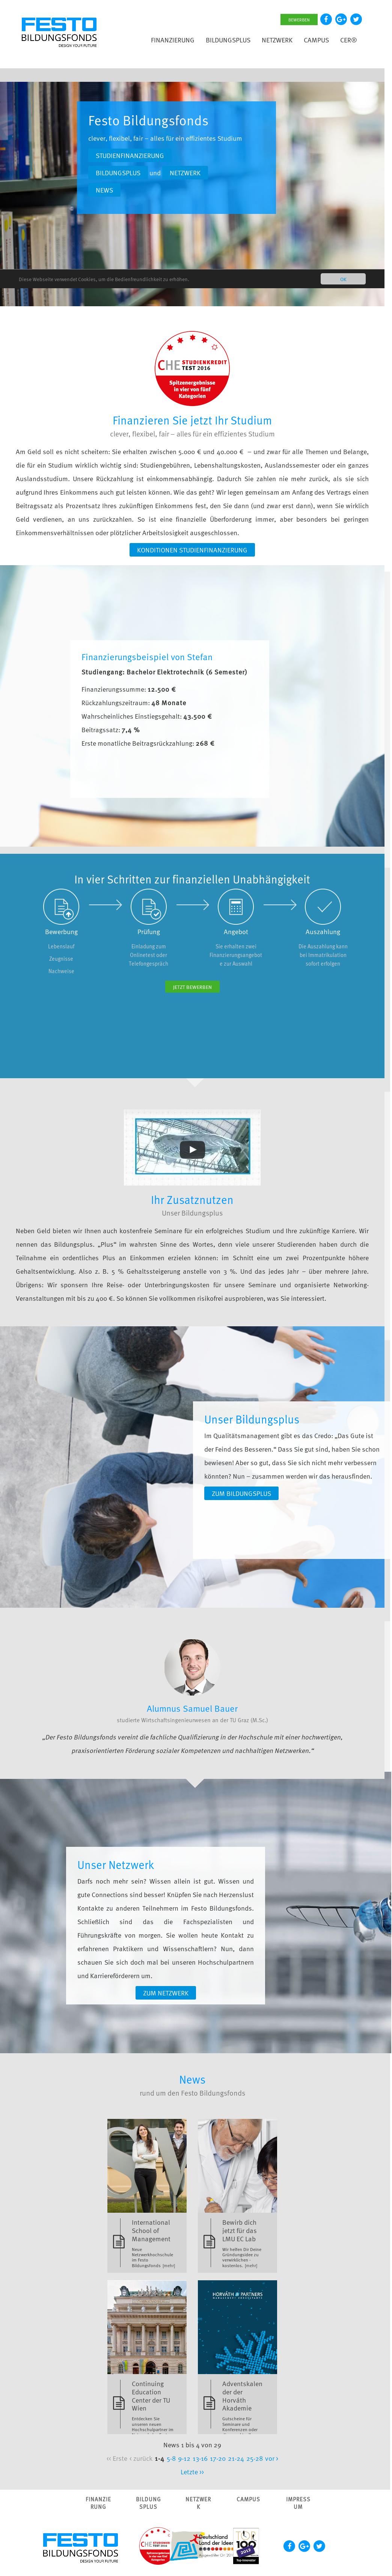 festo bildungsfond website history - Festo Bewerbung